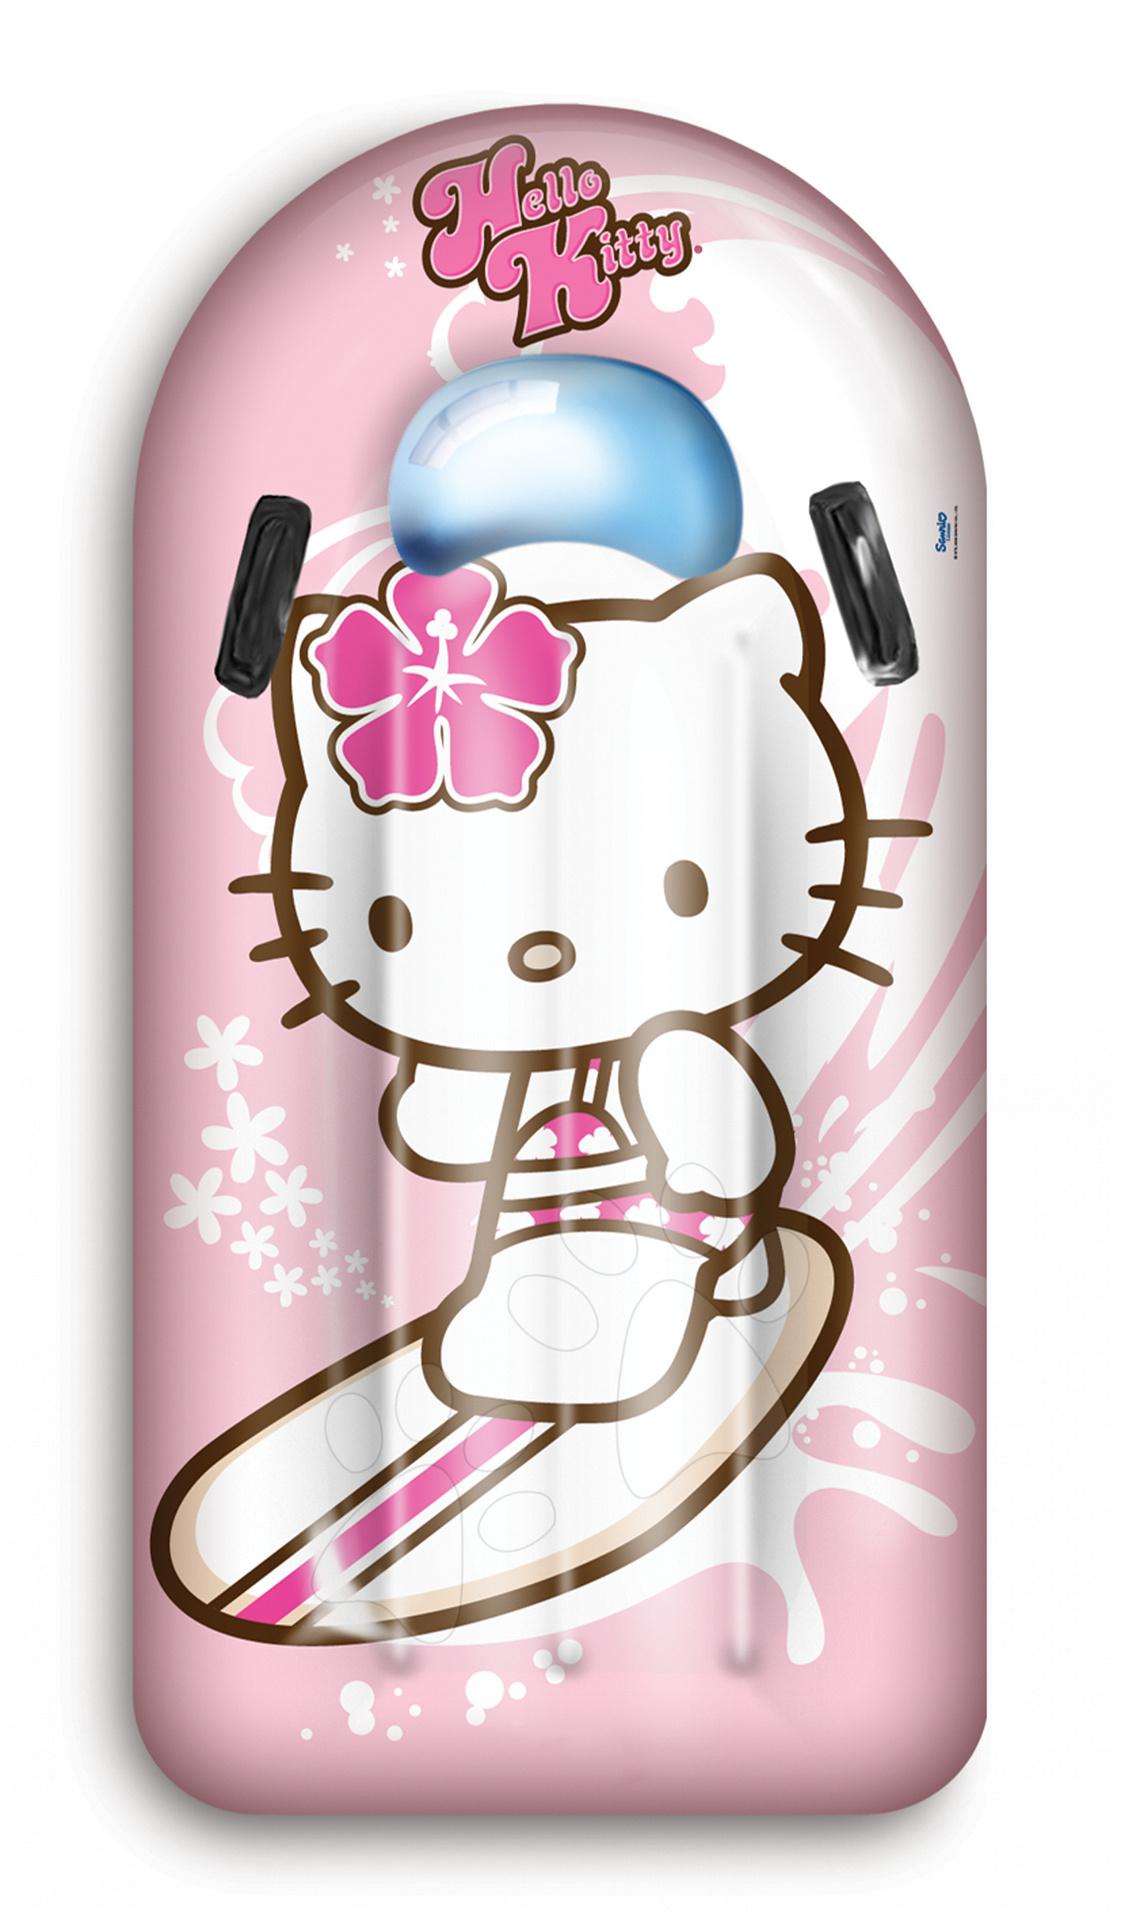 Saltea gonflabilă de surf Hello Kitty Mondo Surf Rider 110 cm